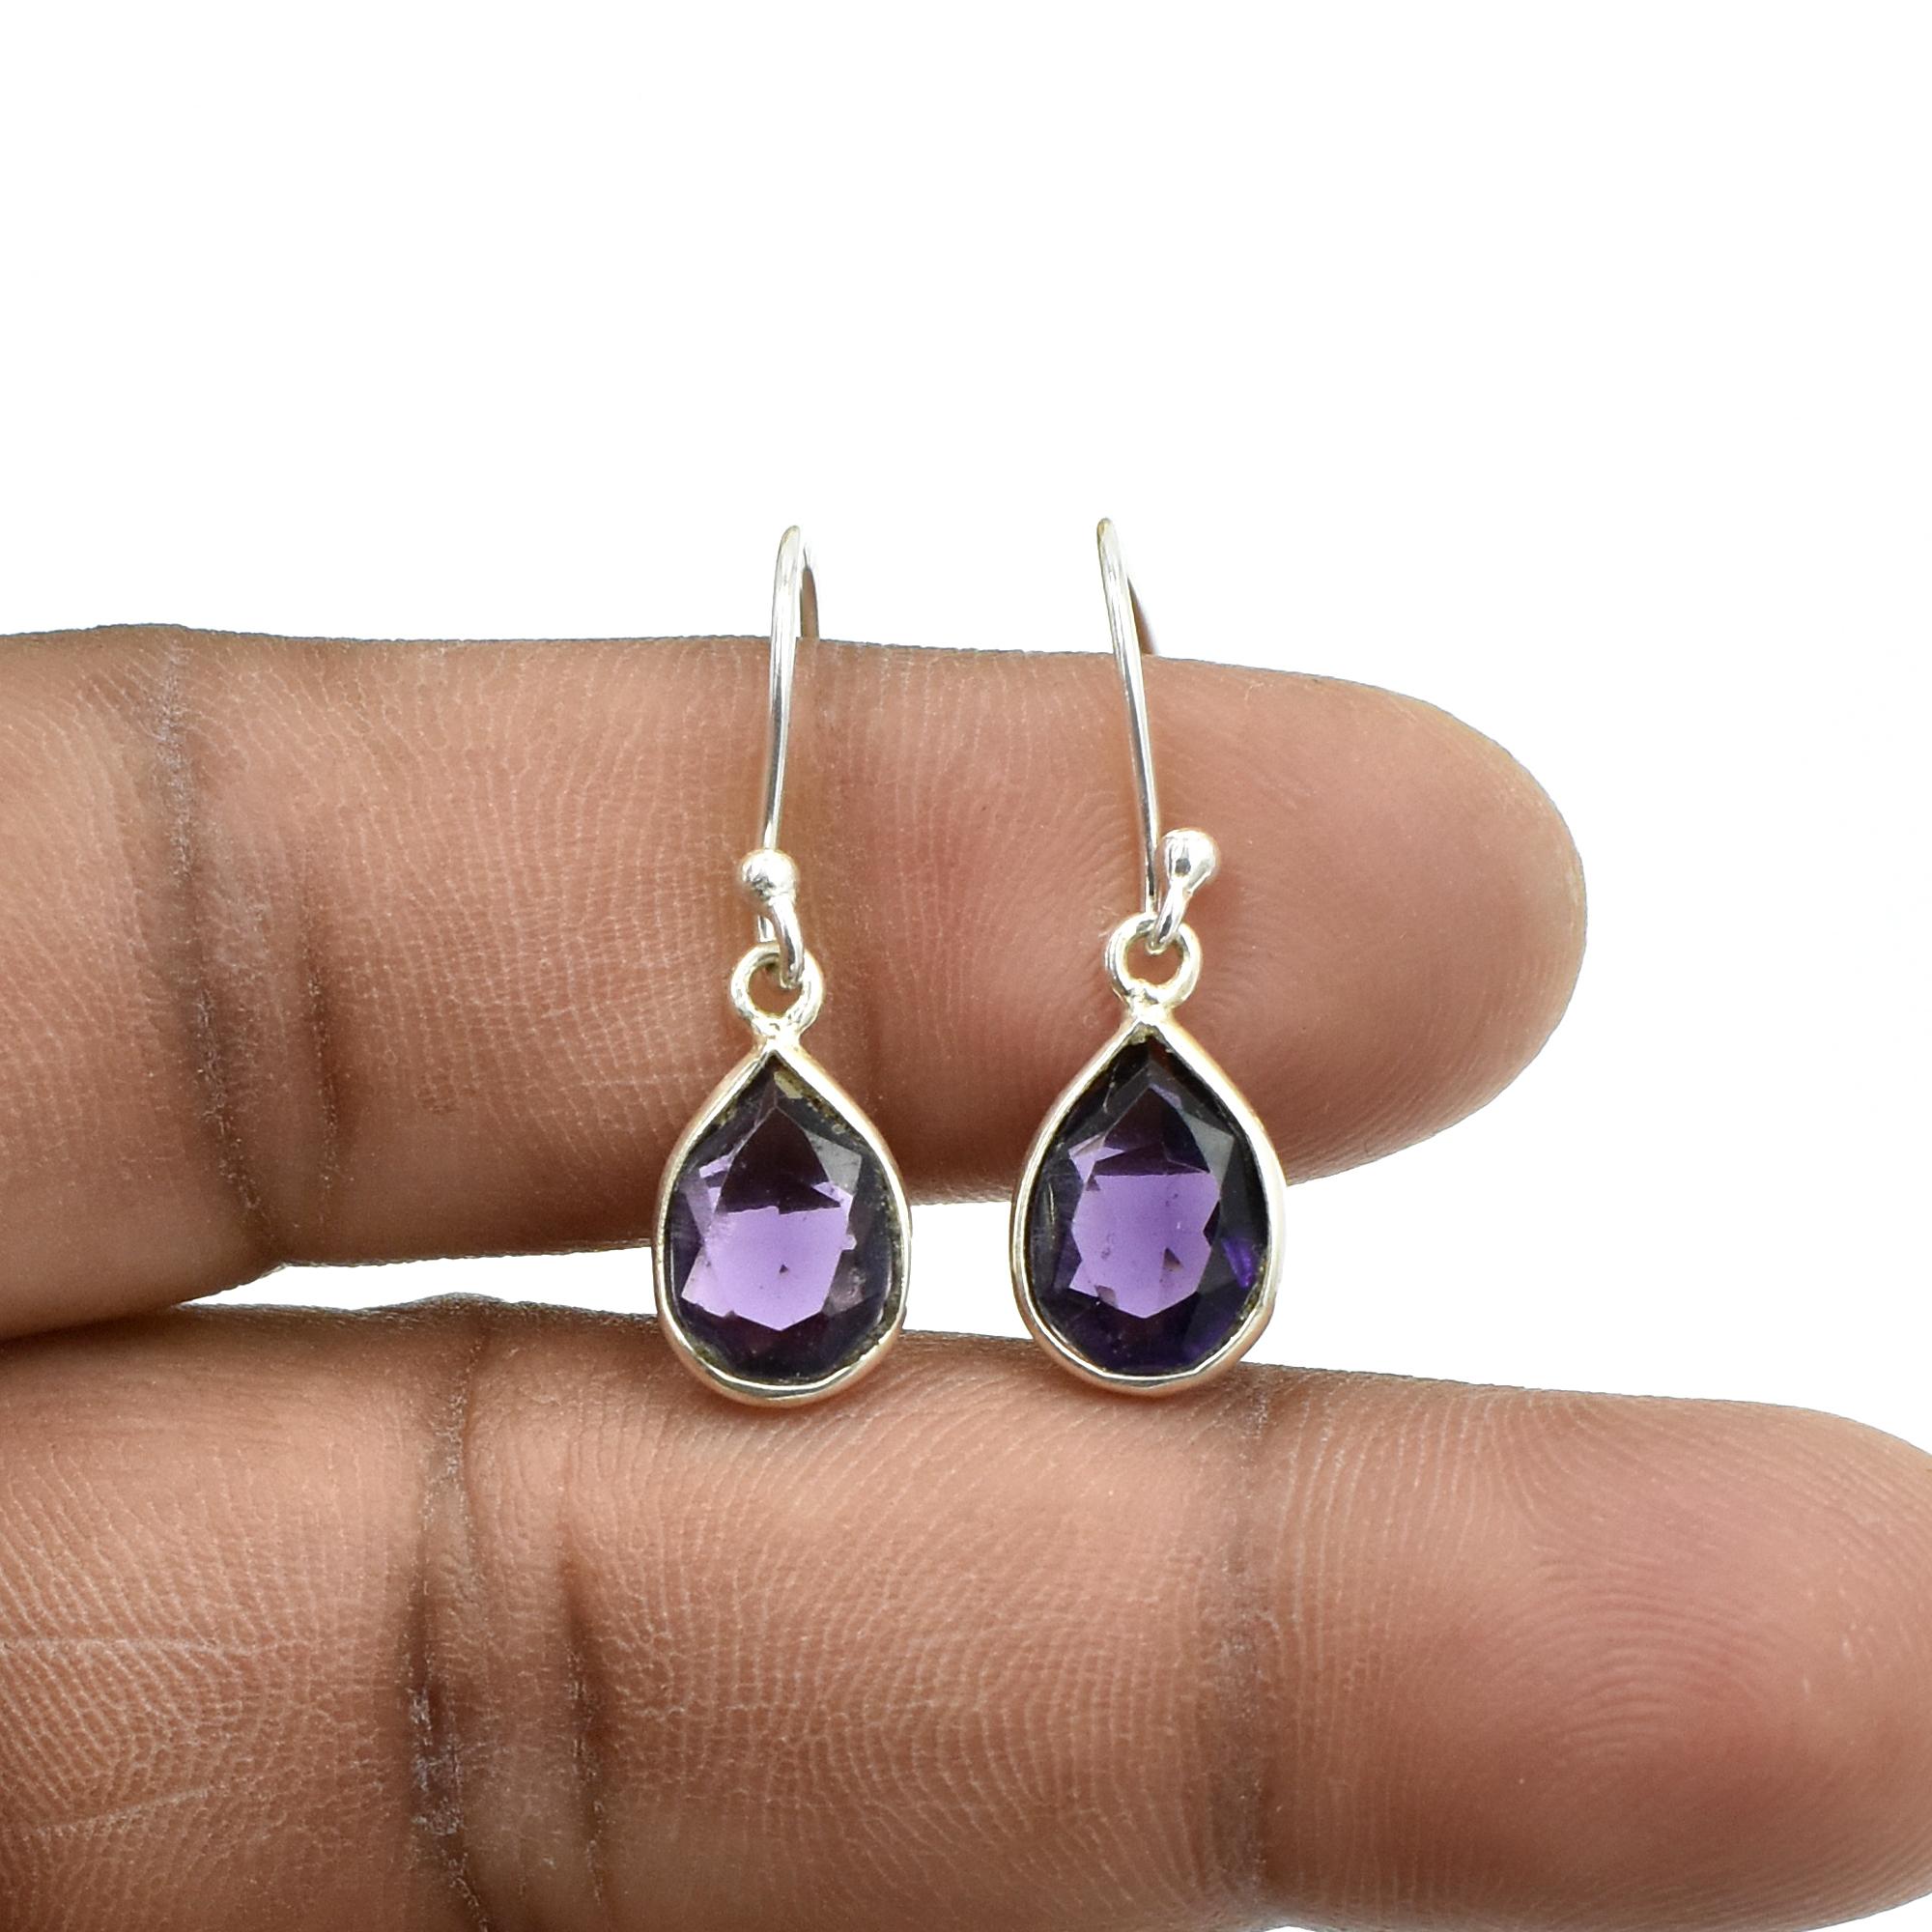 Natural Purple Amethyst Quartz Pear Shape Gemstone Earring 925 Sterling Silver Dangle Drop Fashion Earring